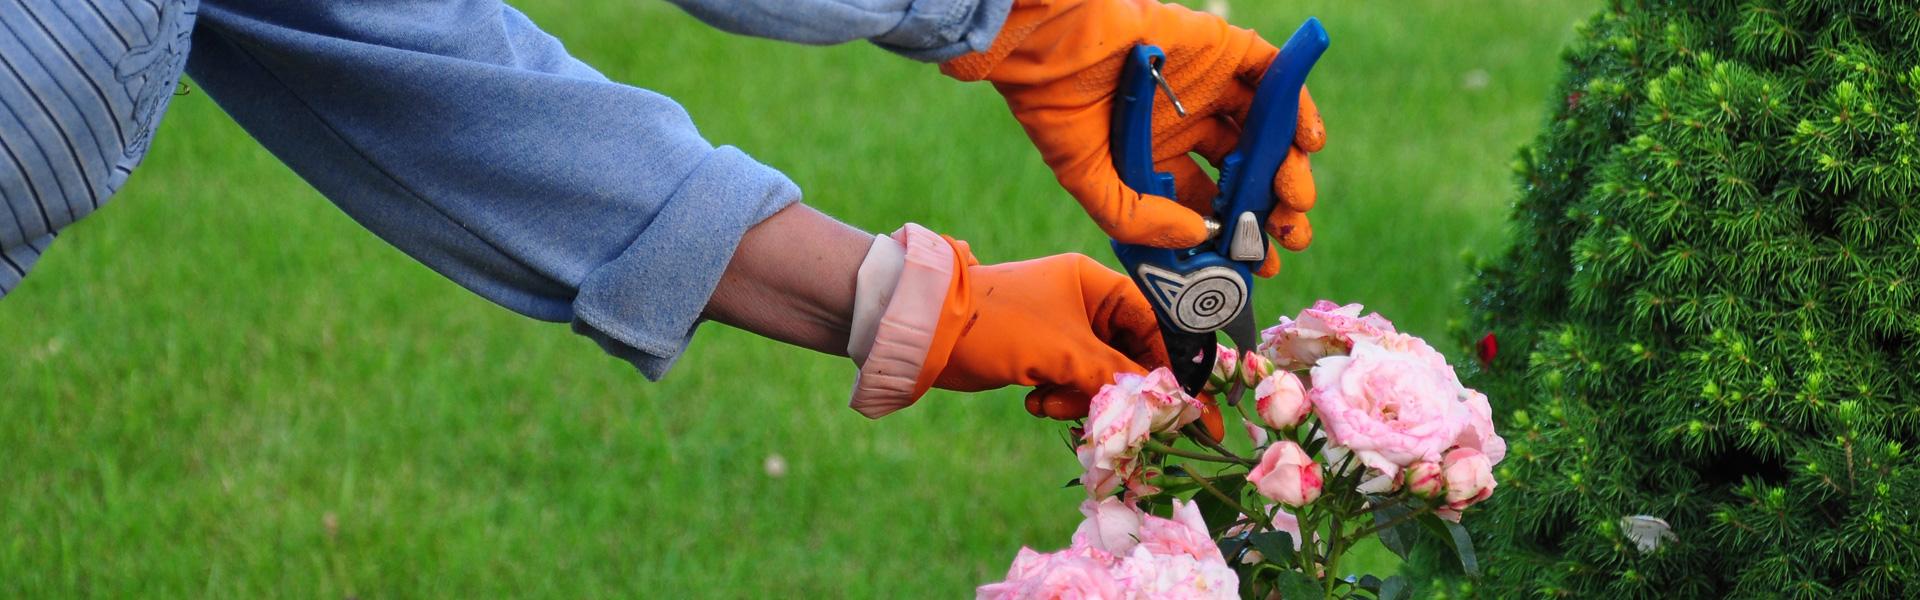 Groenonderhoud - Groenbedrijf Limburg